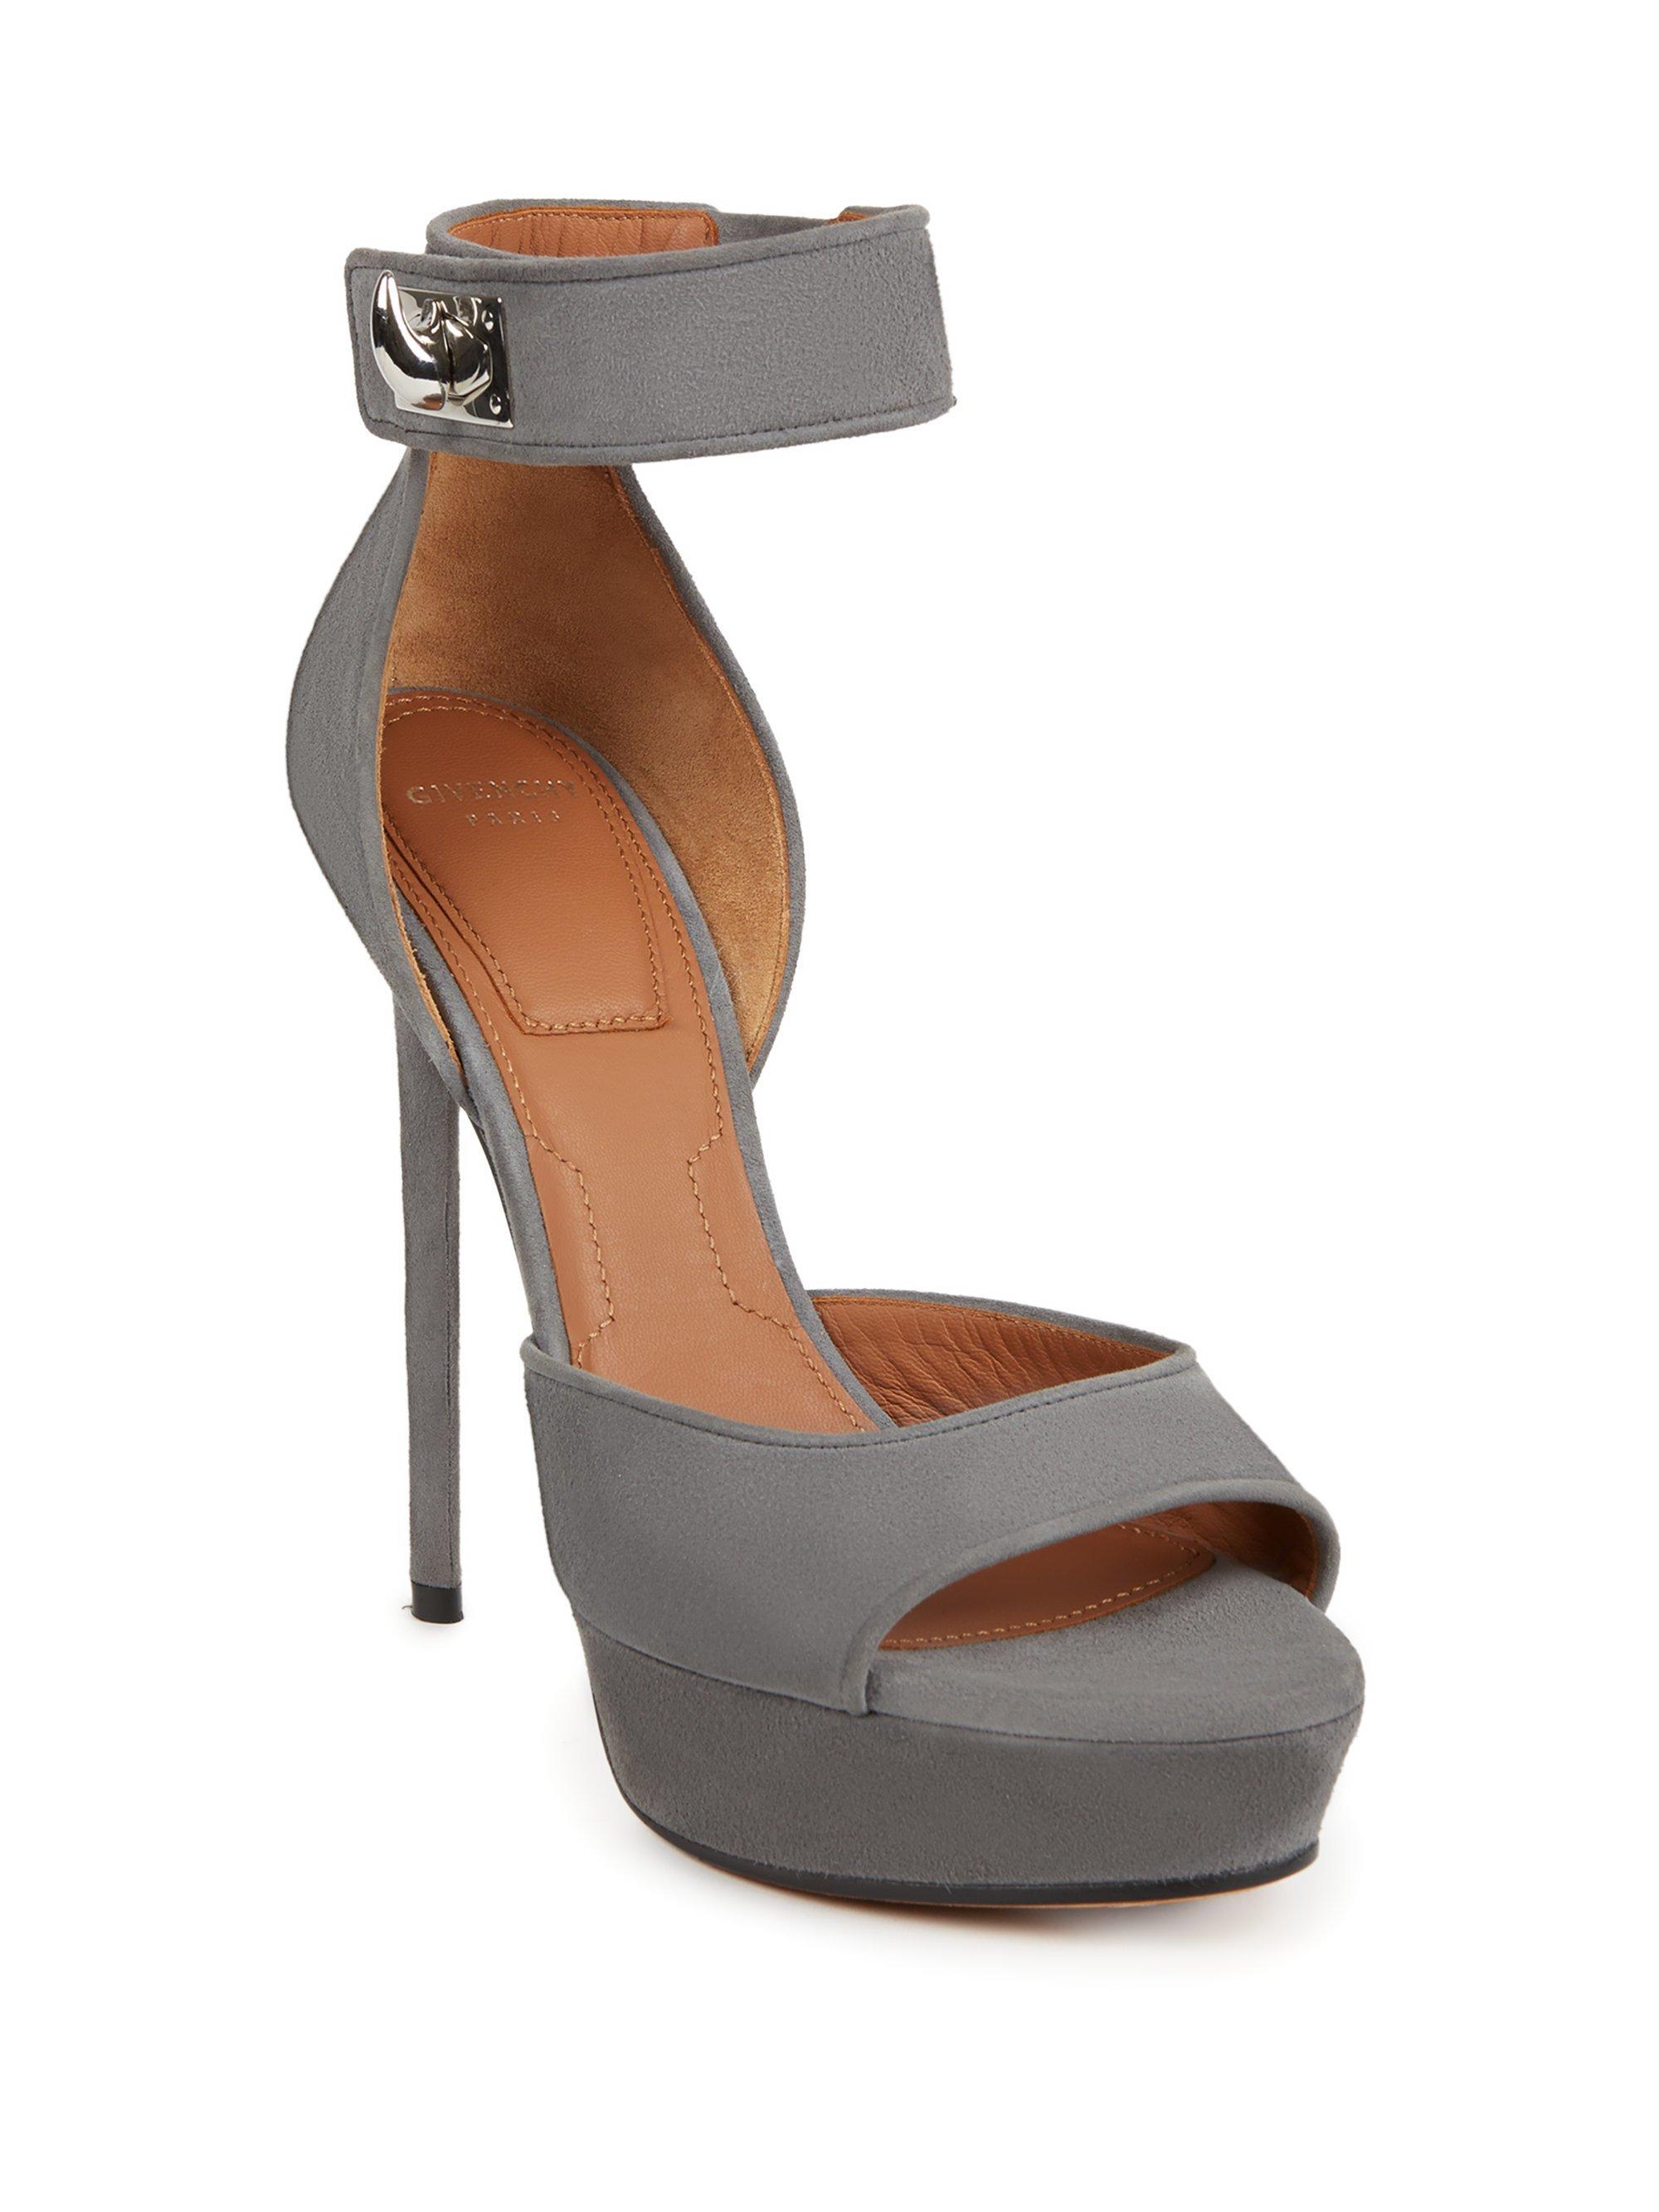 Shark leather plateau sandals Givenchy 0DcuKXv